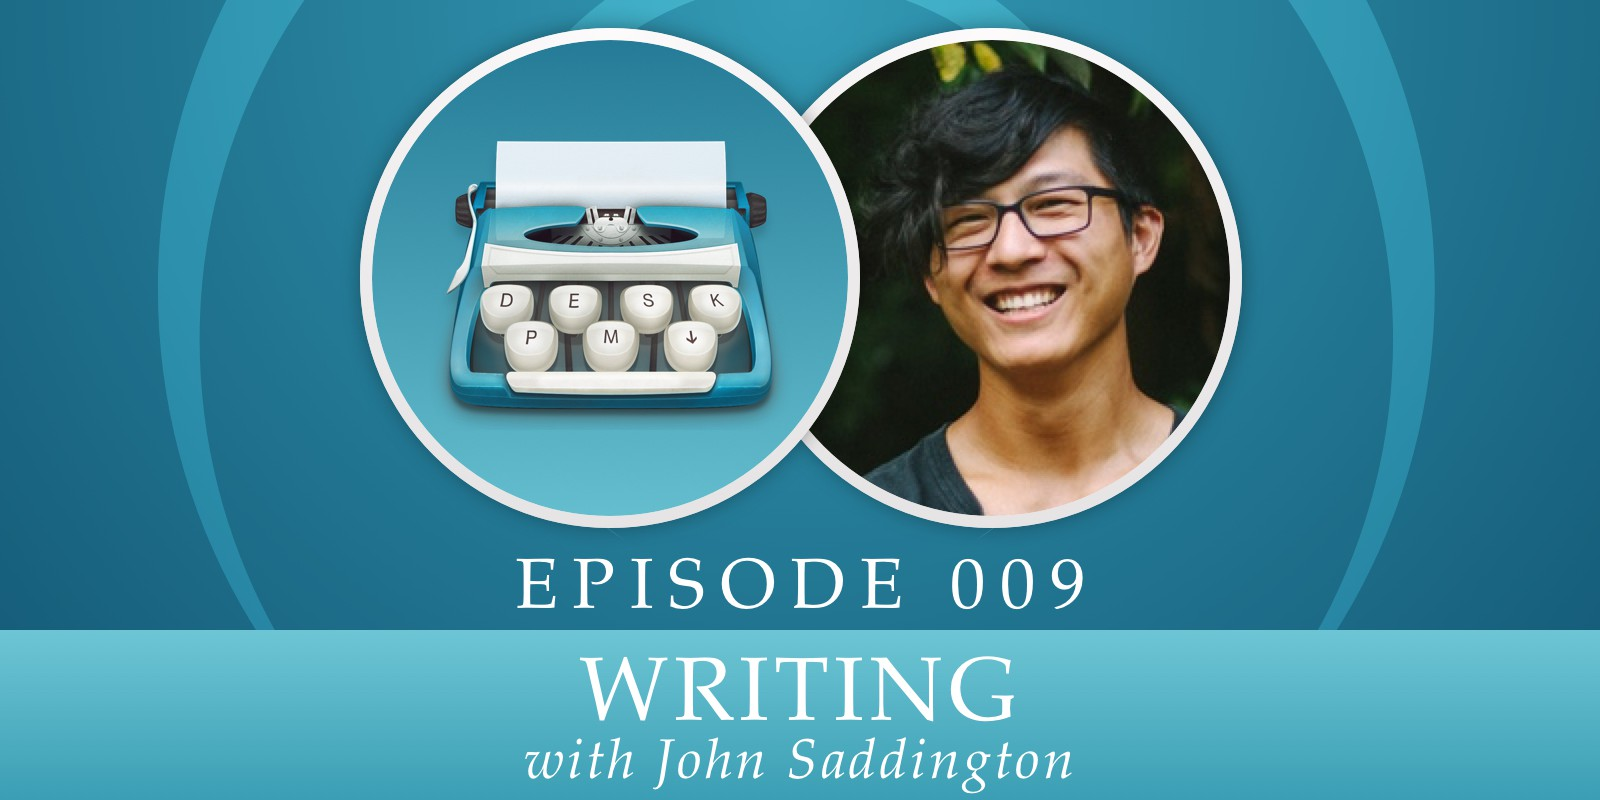 Episode 009: Writing, with John Saddington